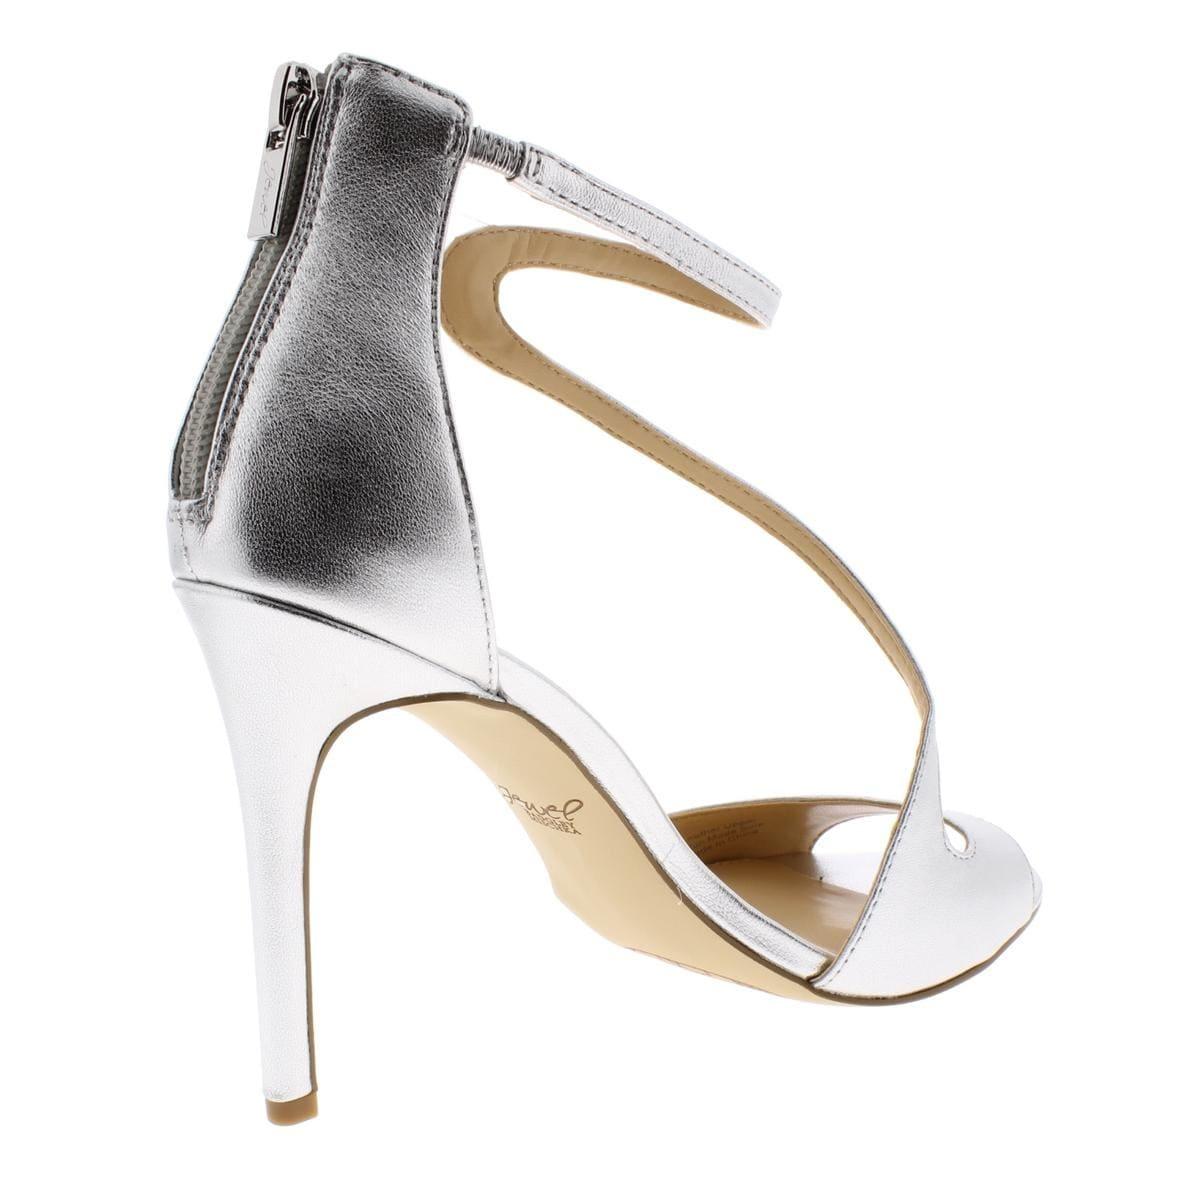 795d282d7b9 Shop Jewel Badgley Mischka Womens Tayler Evening Sandals Leather Metallic -  Free Shipping Today - Overstock - 27784128